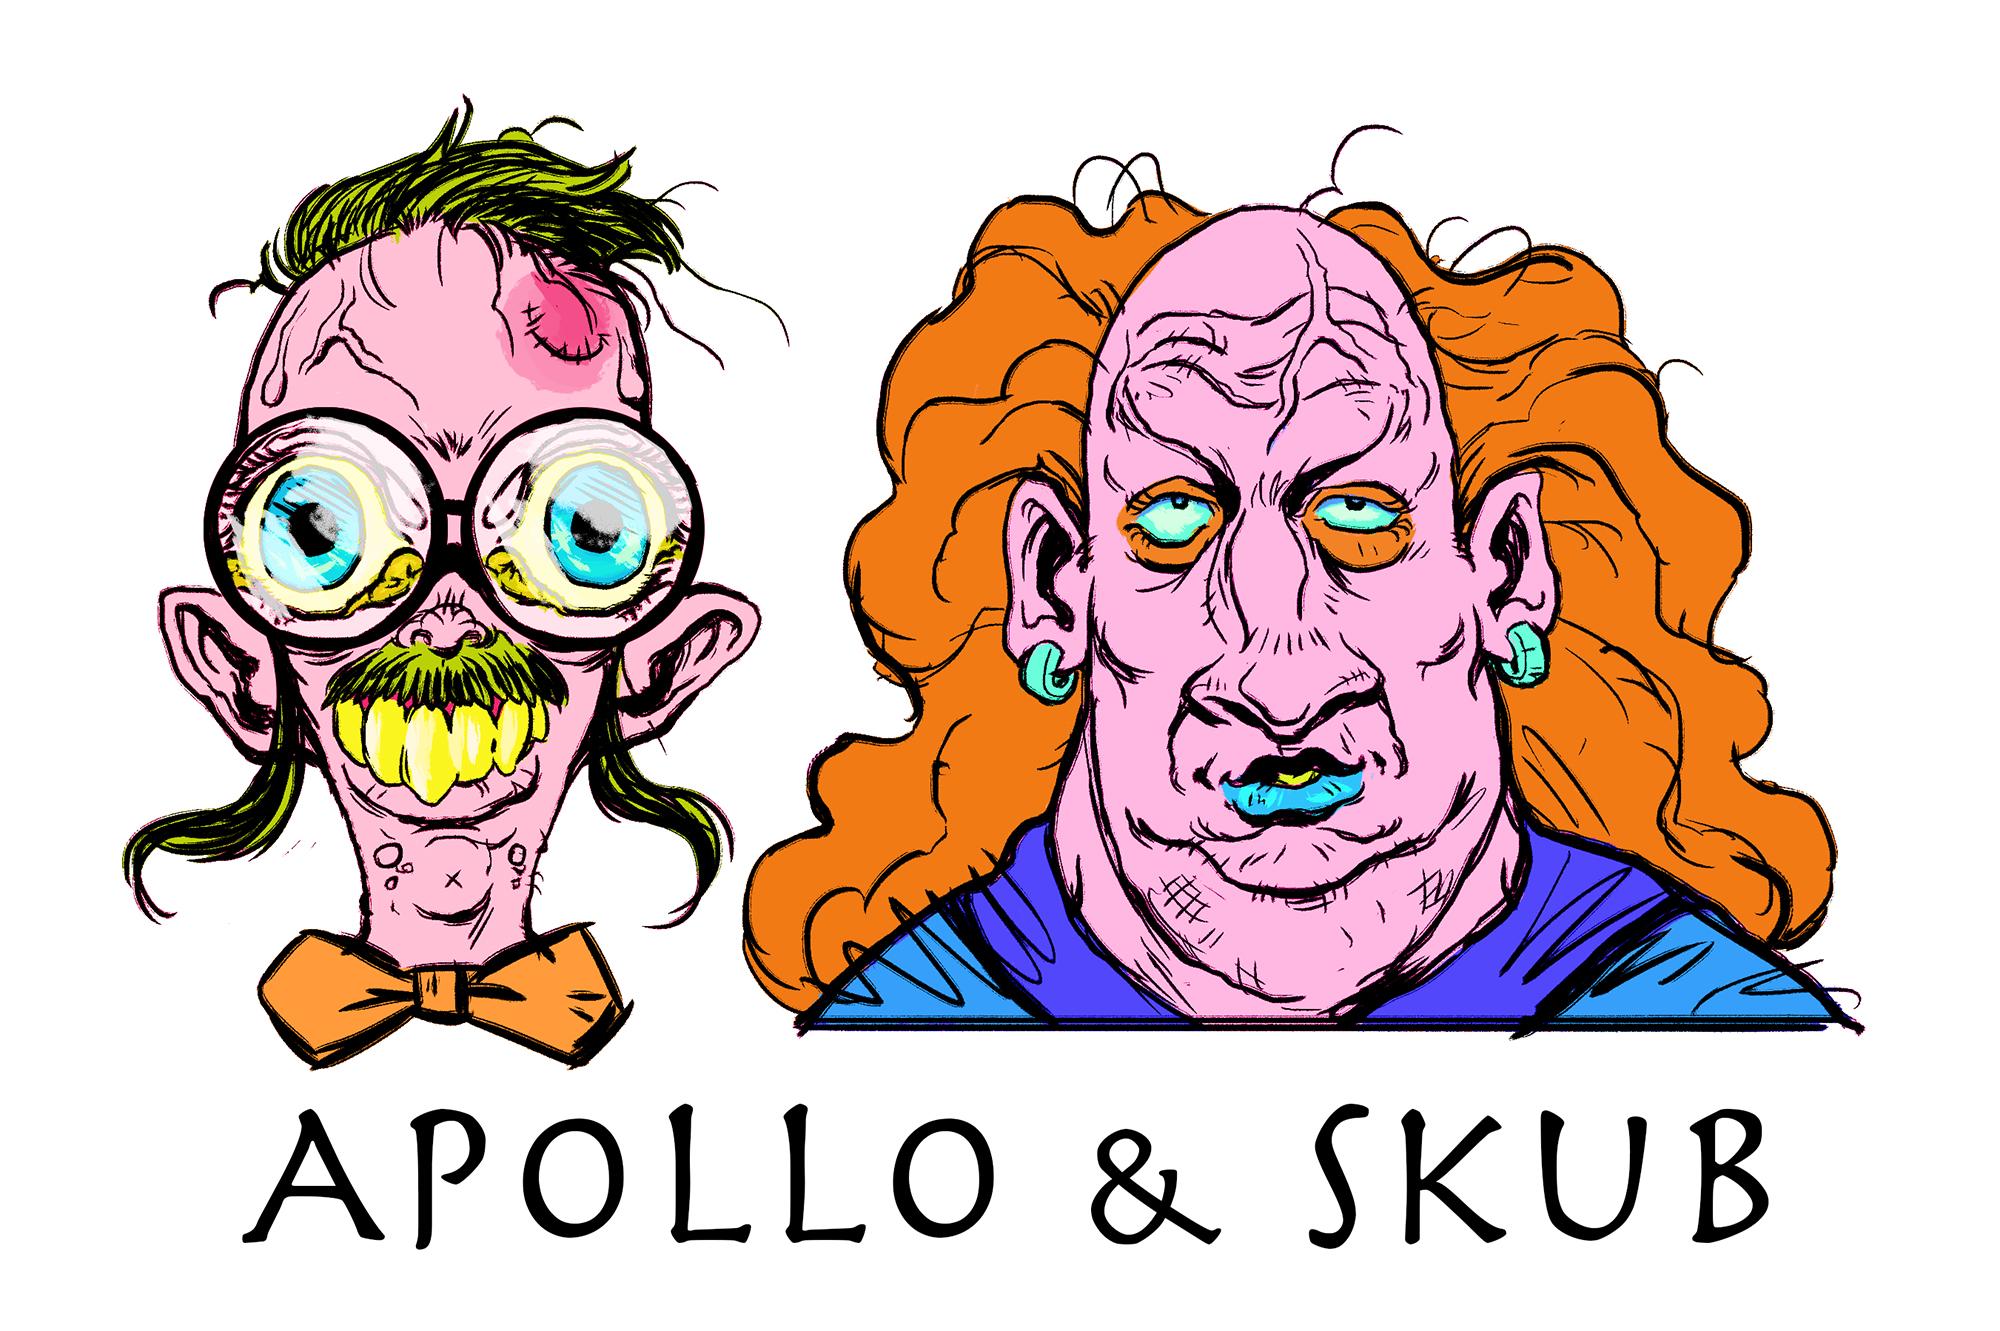 Apollo & Skub